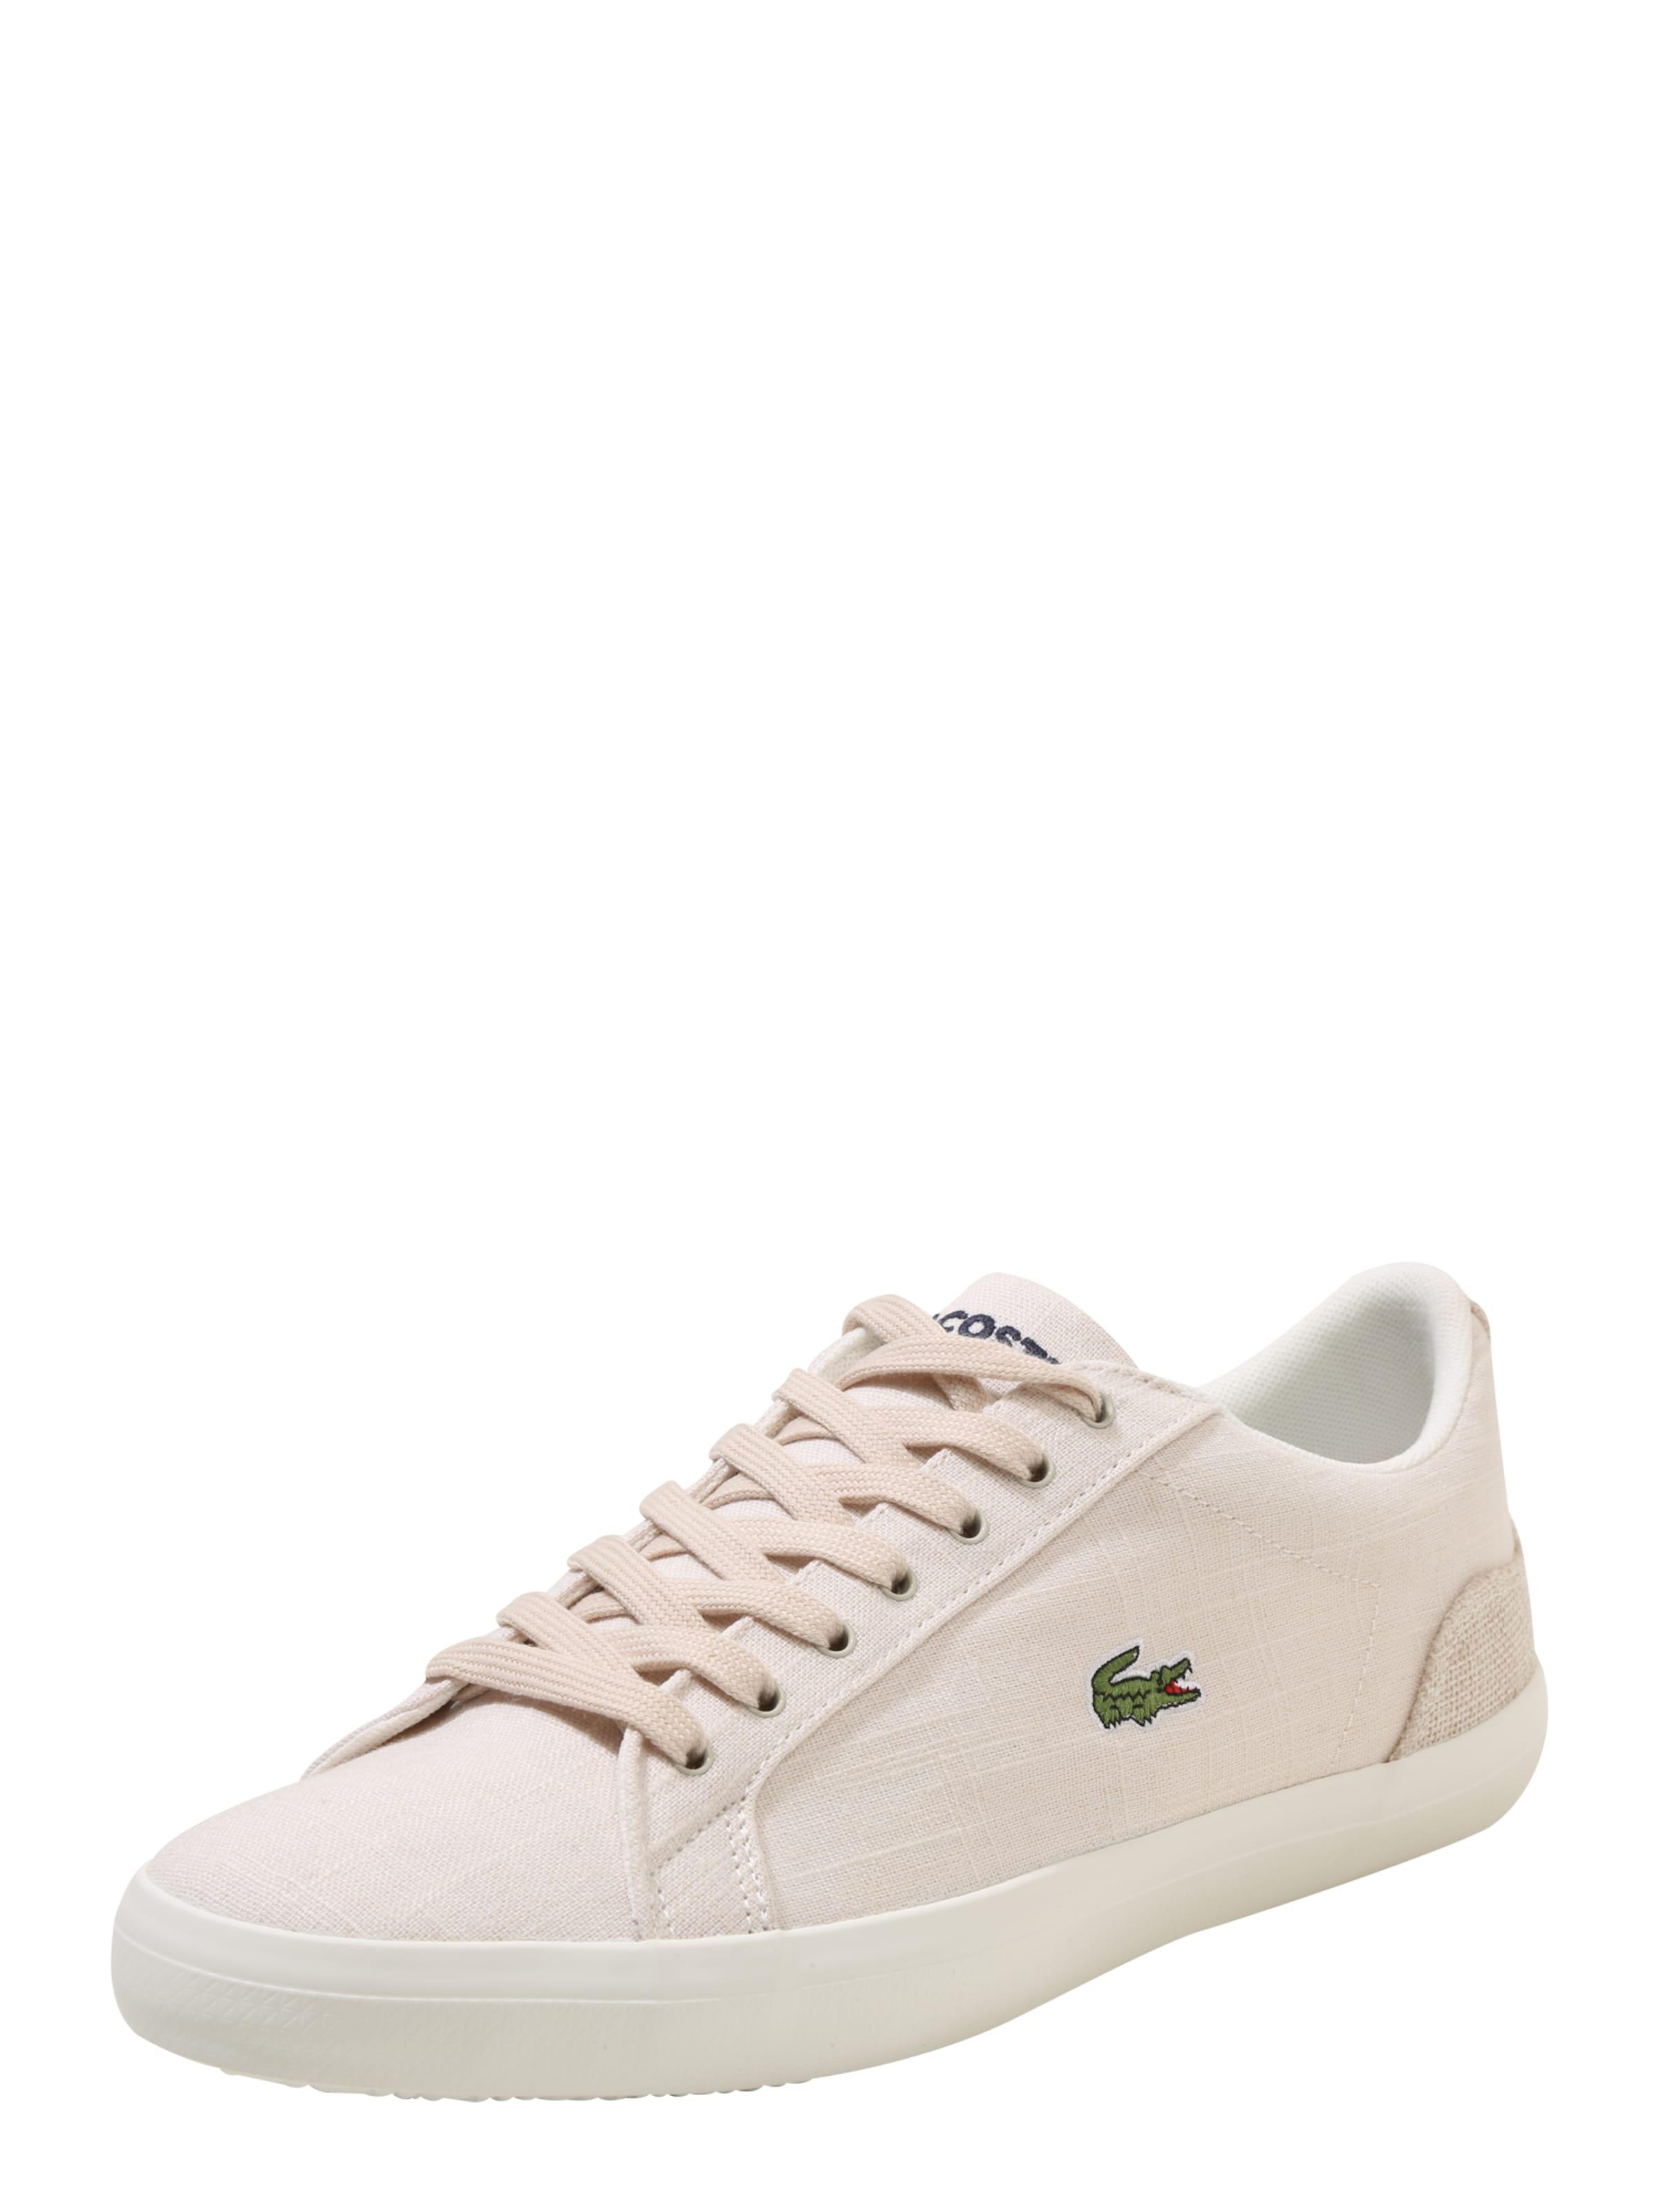 LACOSTE Sneaker LEROND Verschleißfeste Schuhe billige Schuhe Verschleißfeste c83570